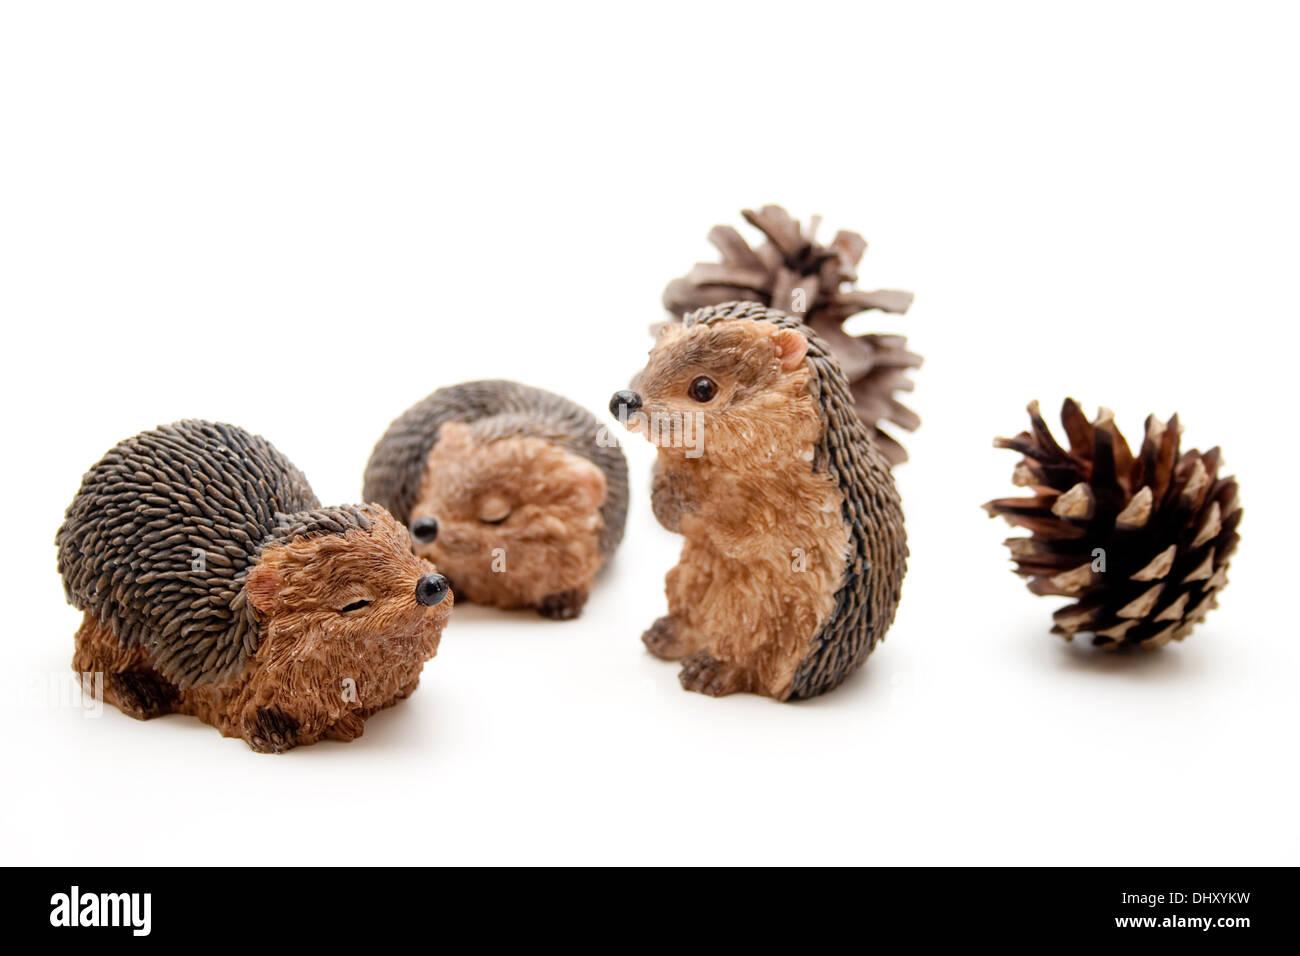 Hedgehog figure - Stock Image